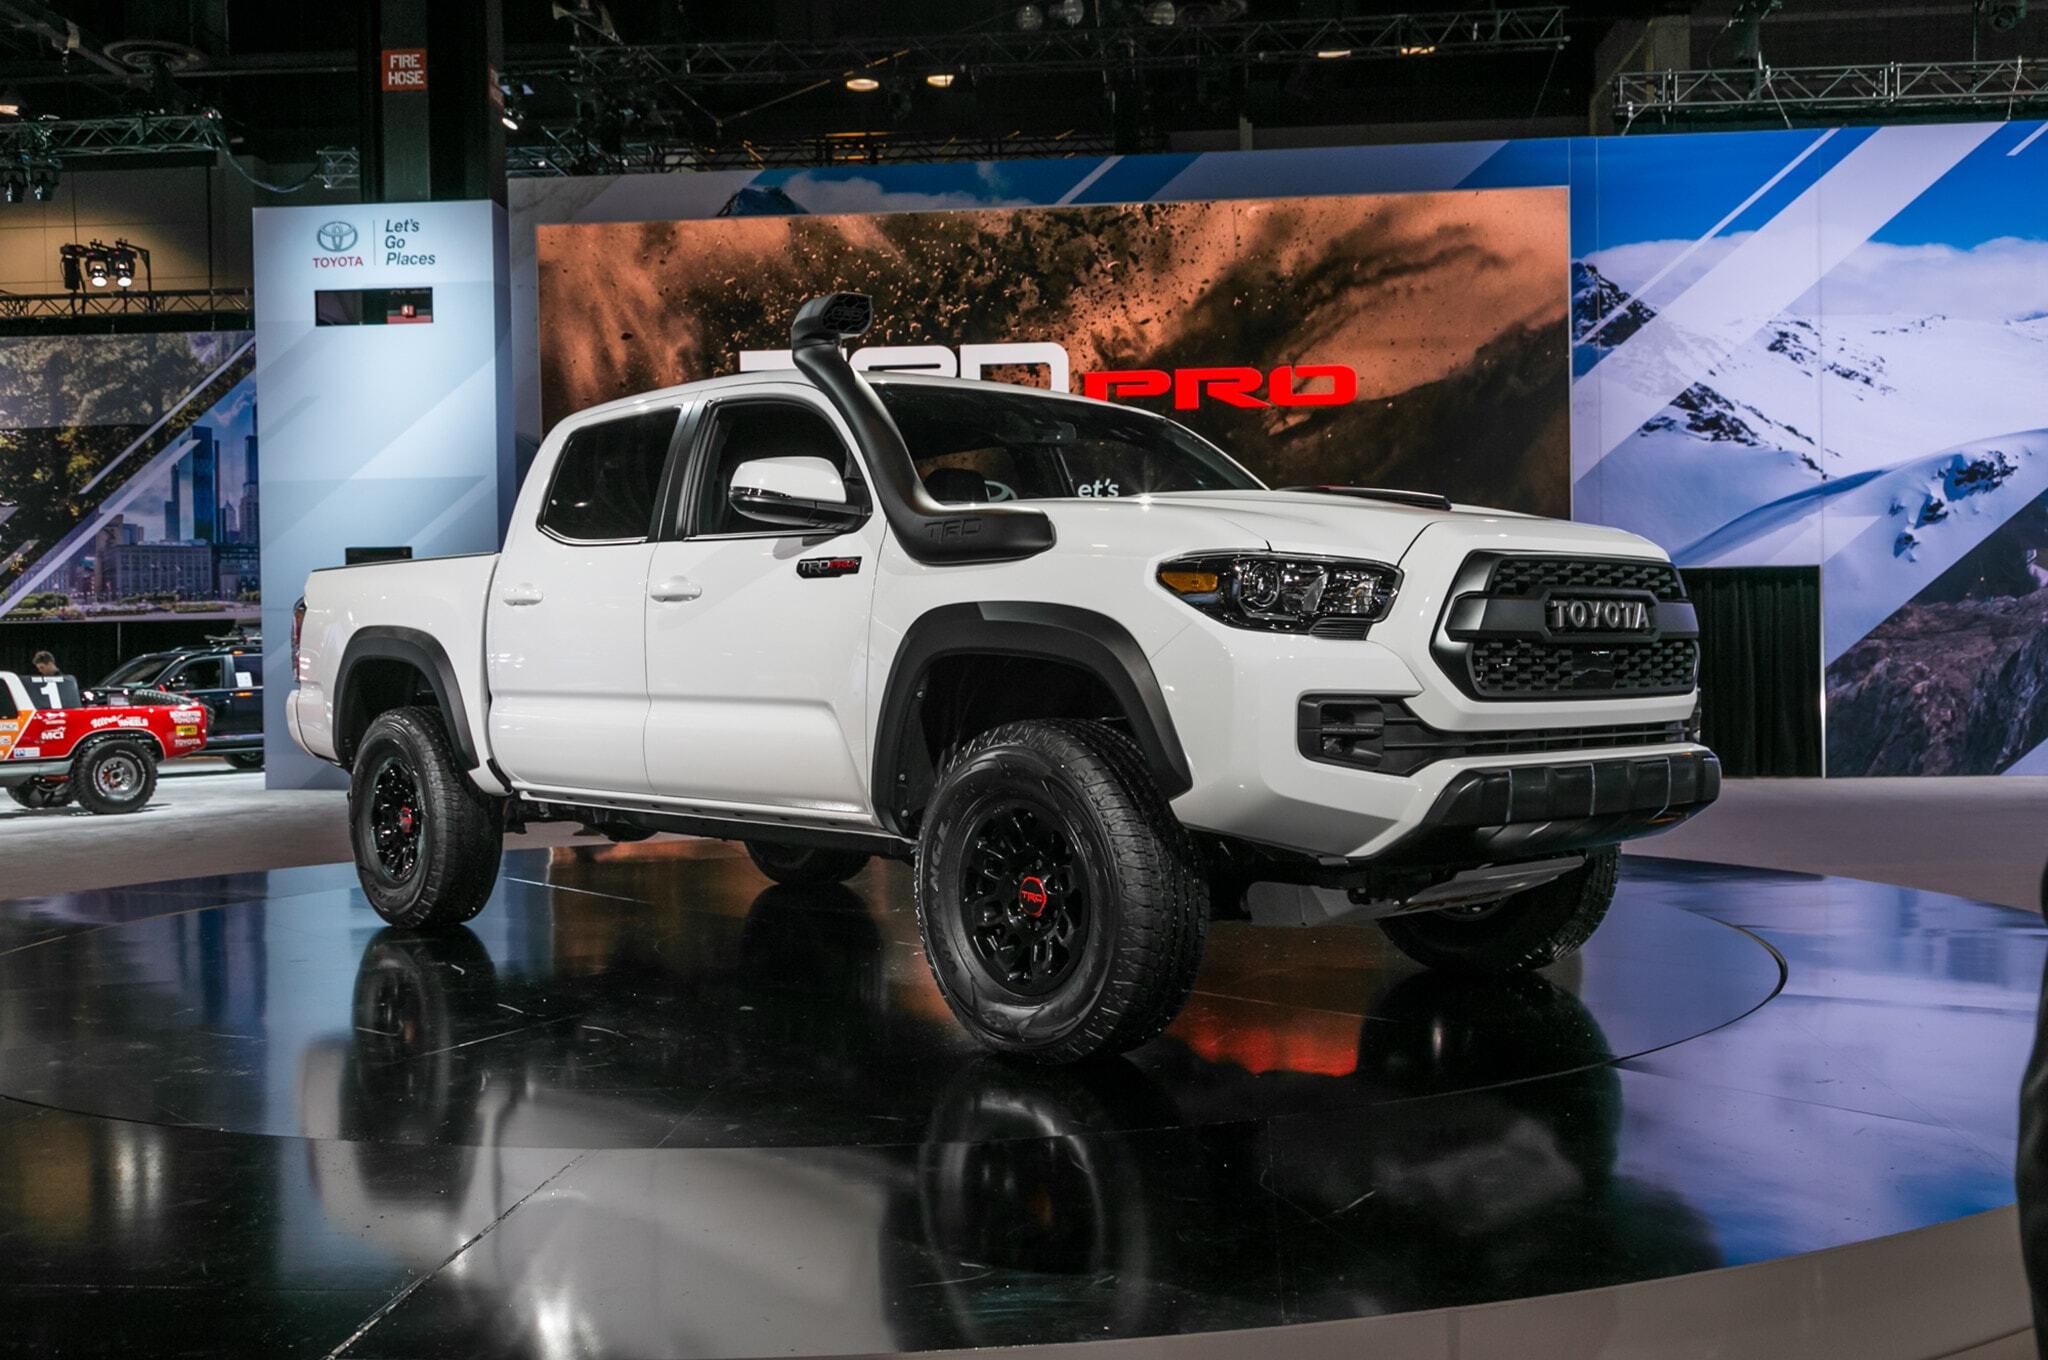 2019-Toyota-Tacoma-TRD-Pro-front-three-quarter-01-1